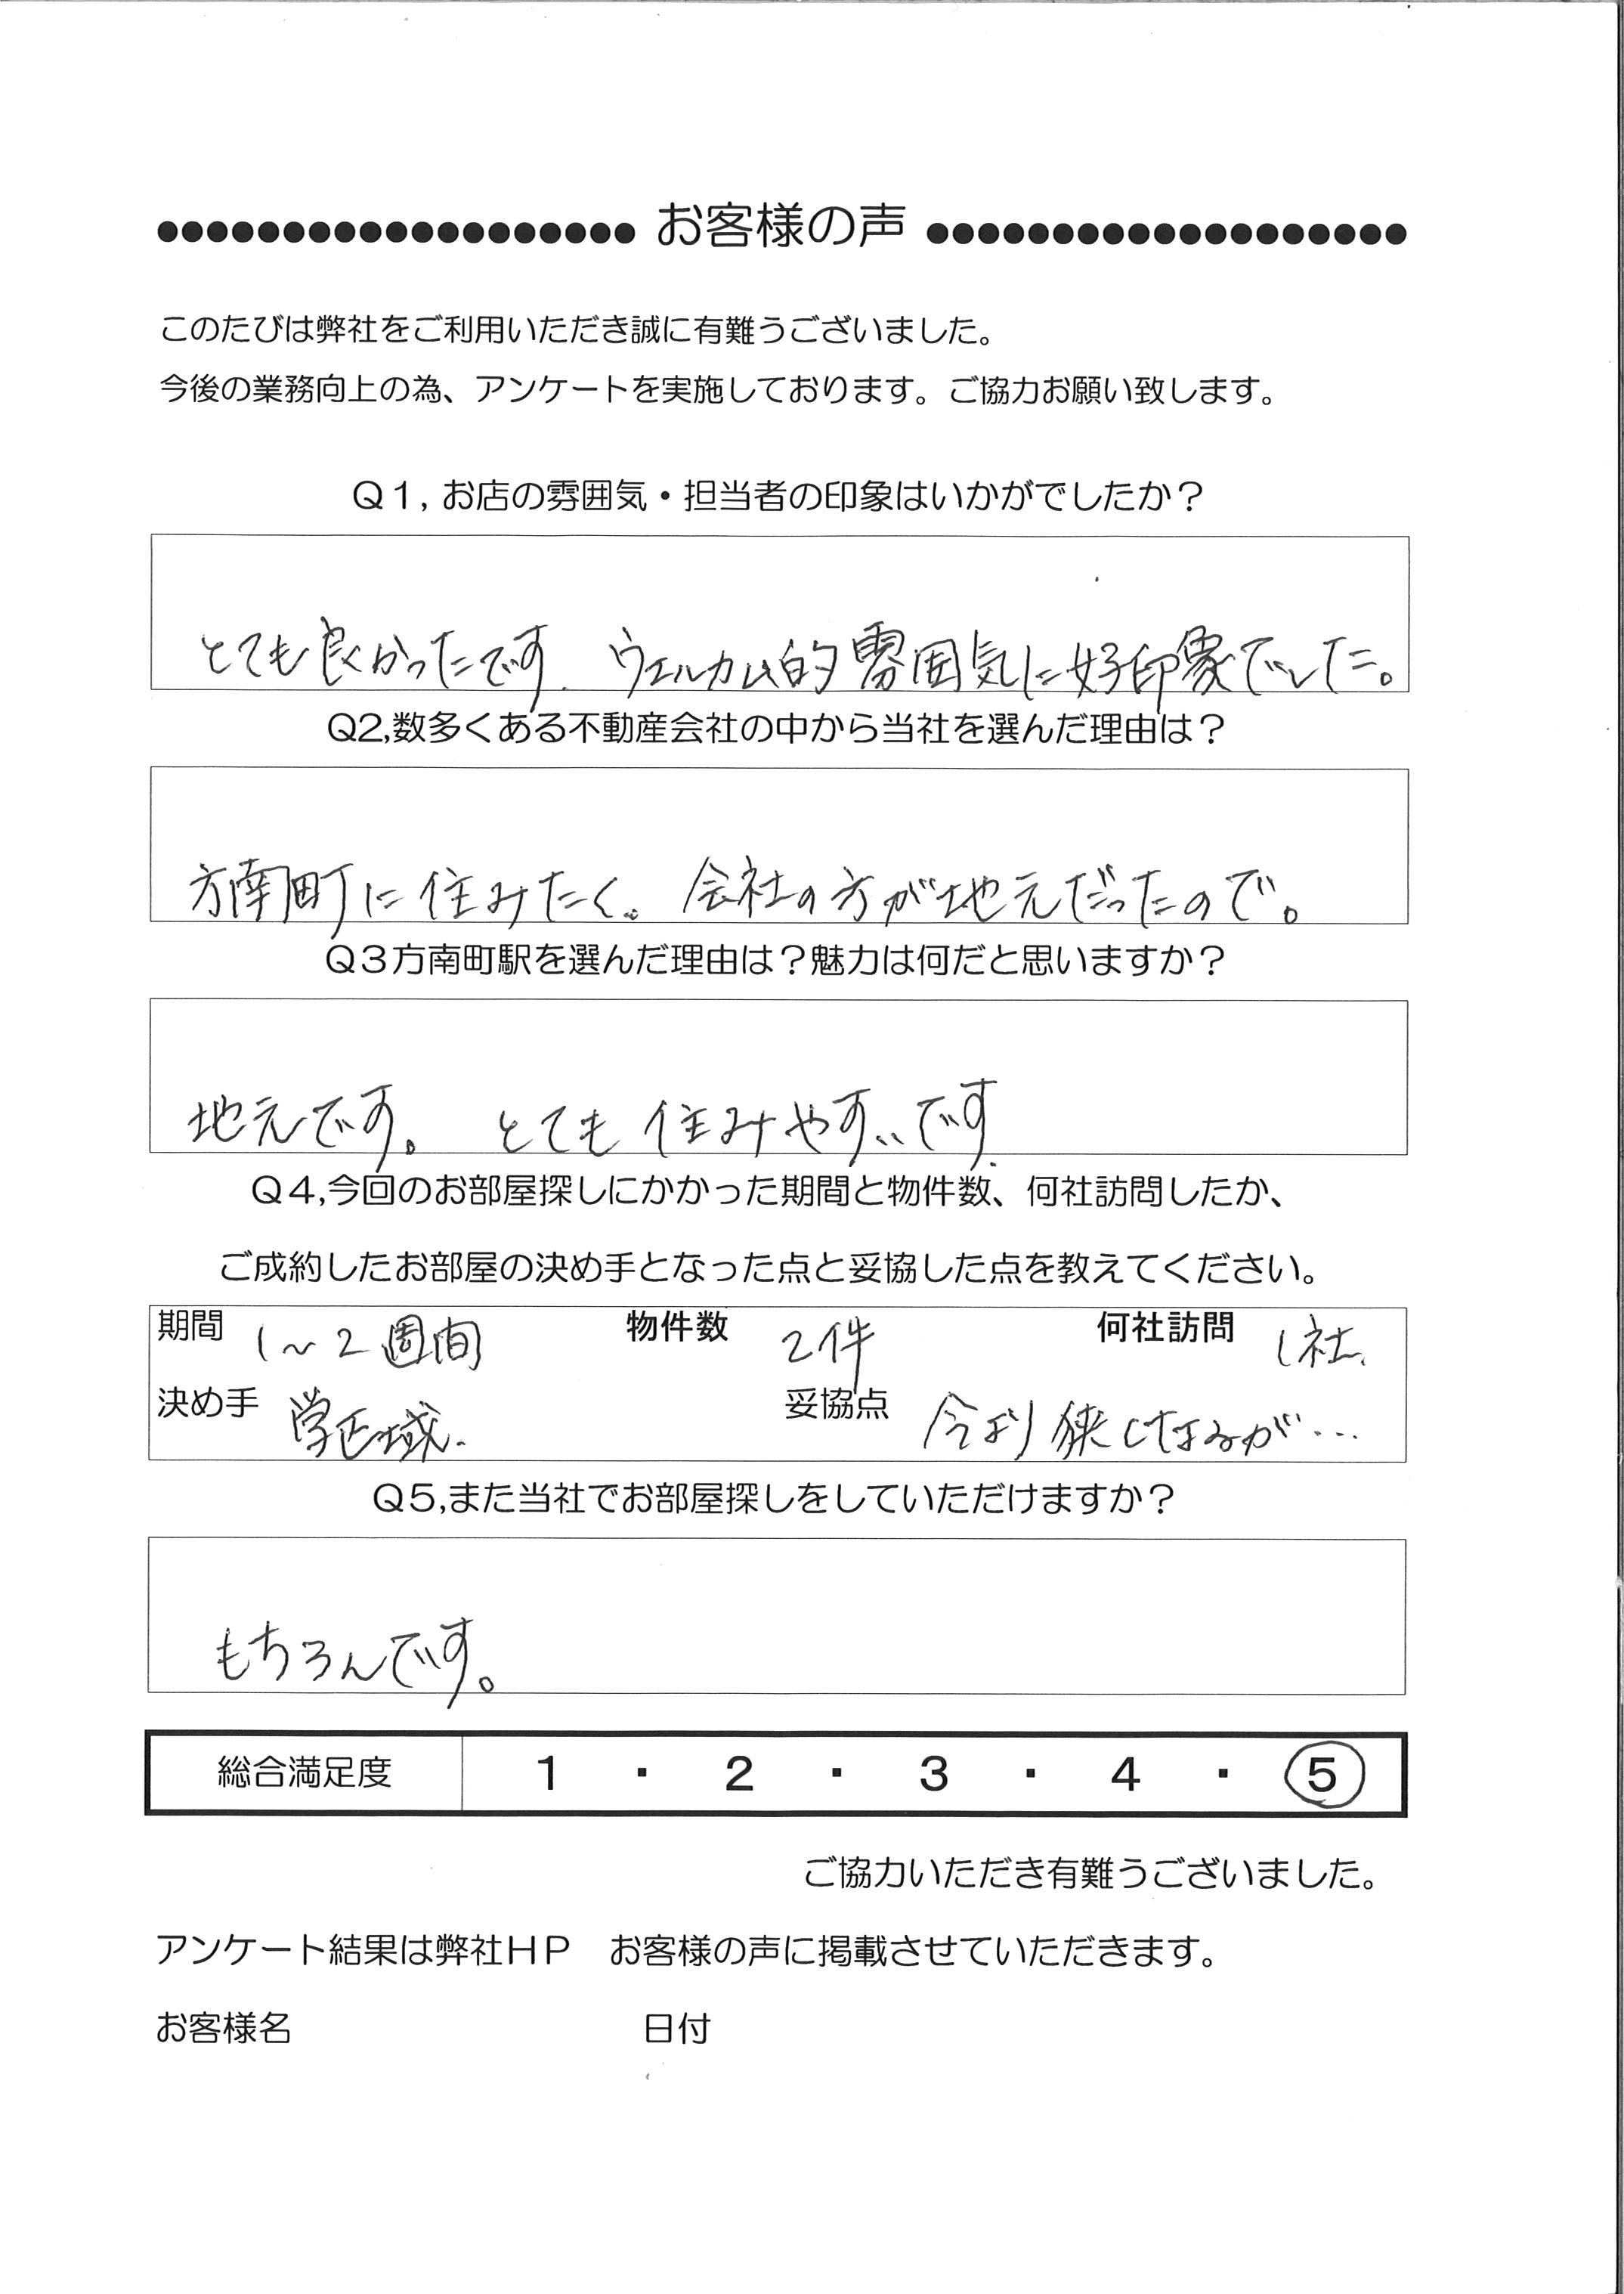 Y・Y 様 (39歳)女性(会社員)アンケート回答